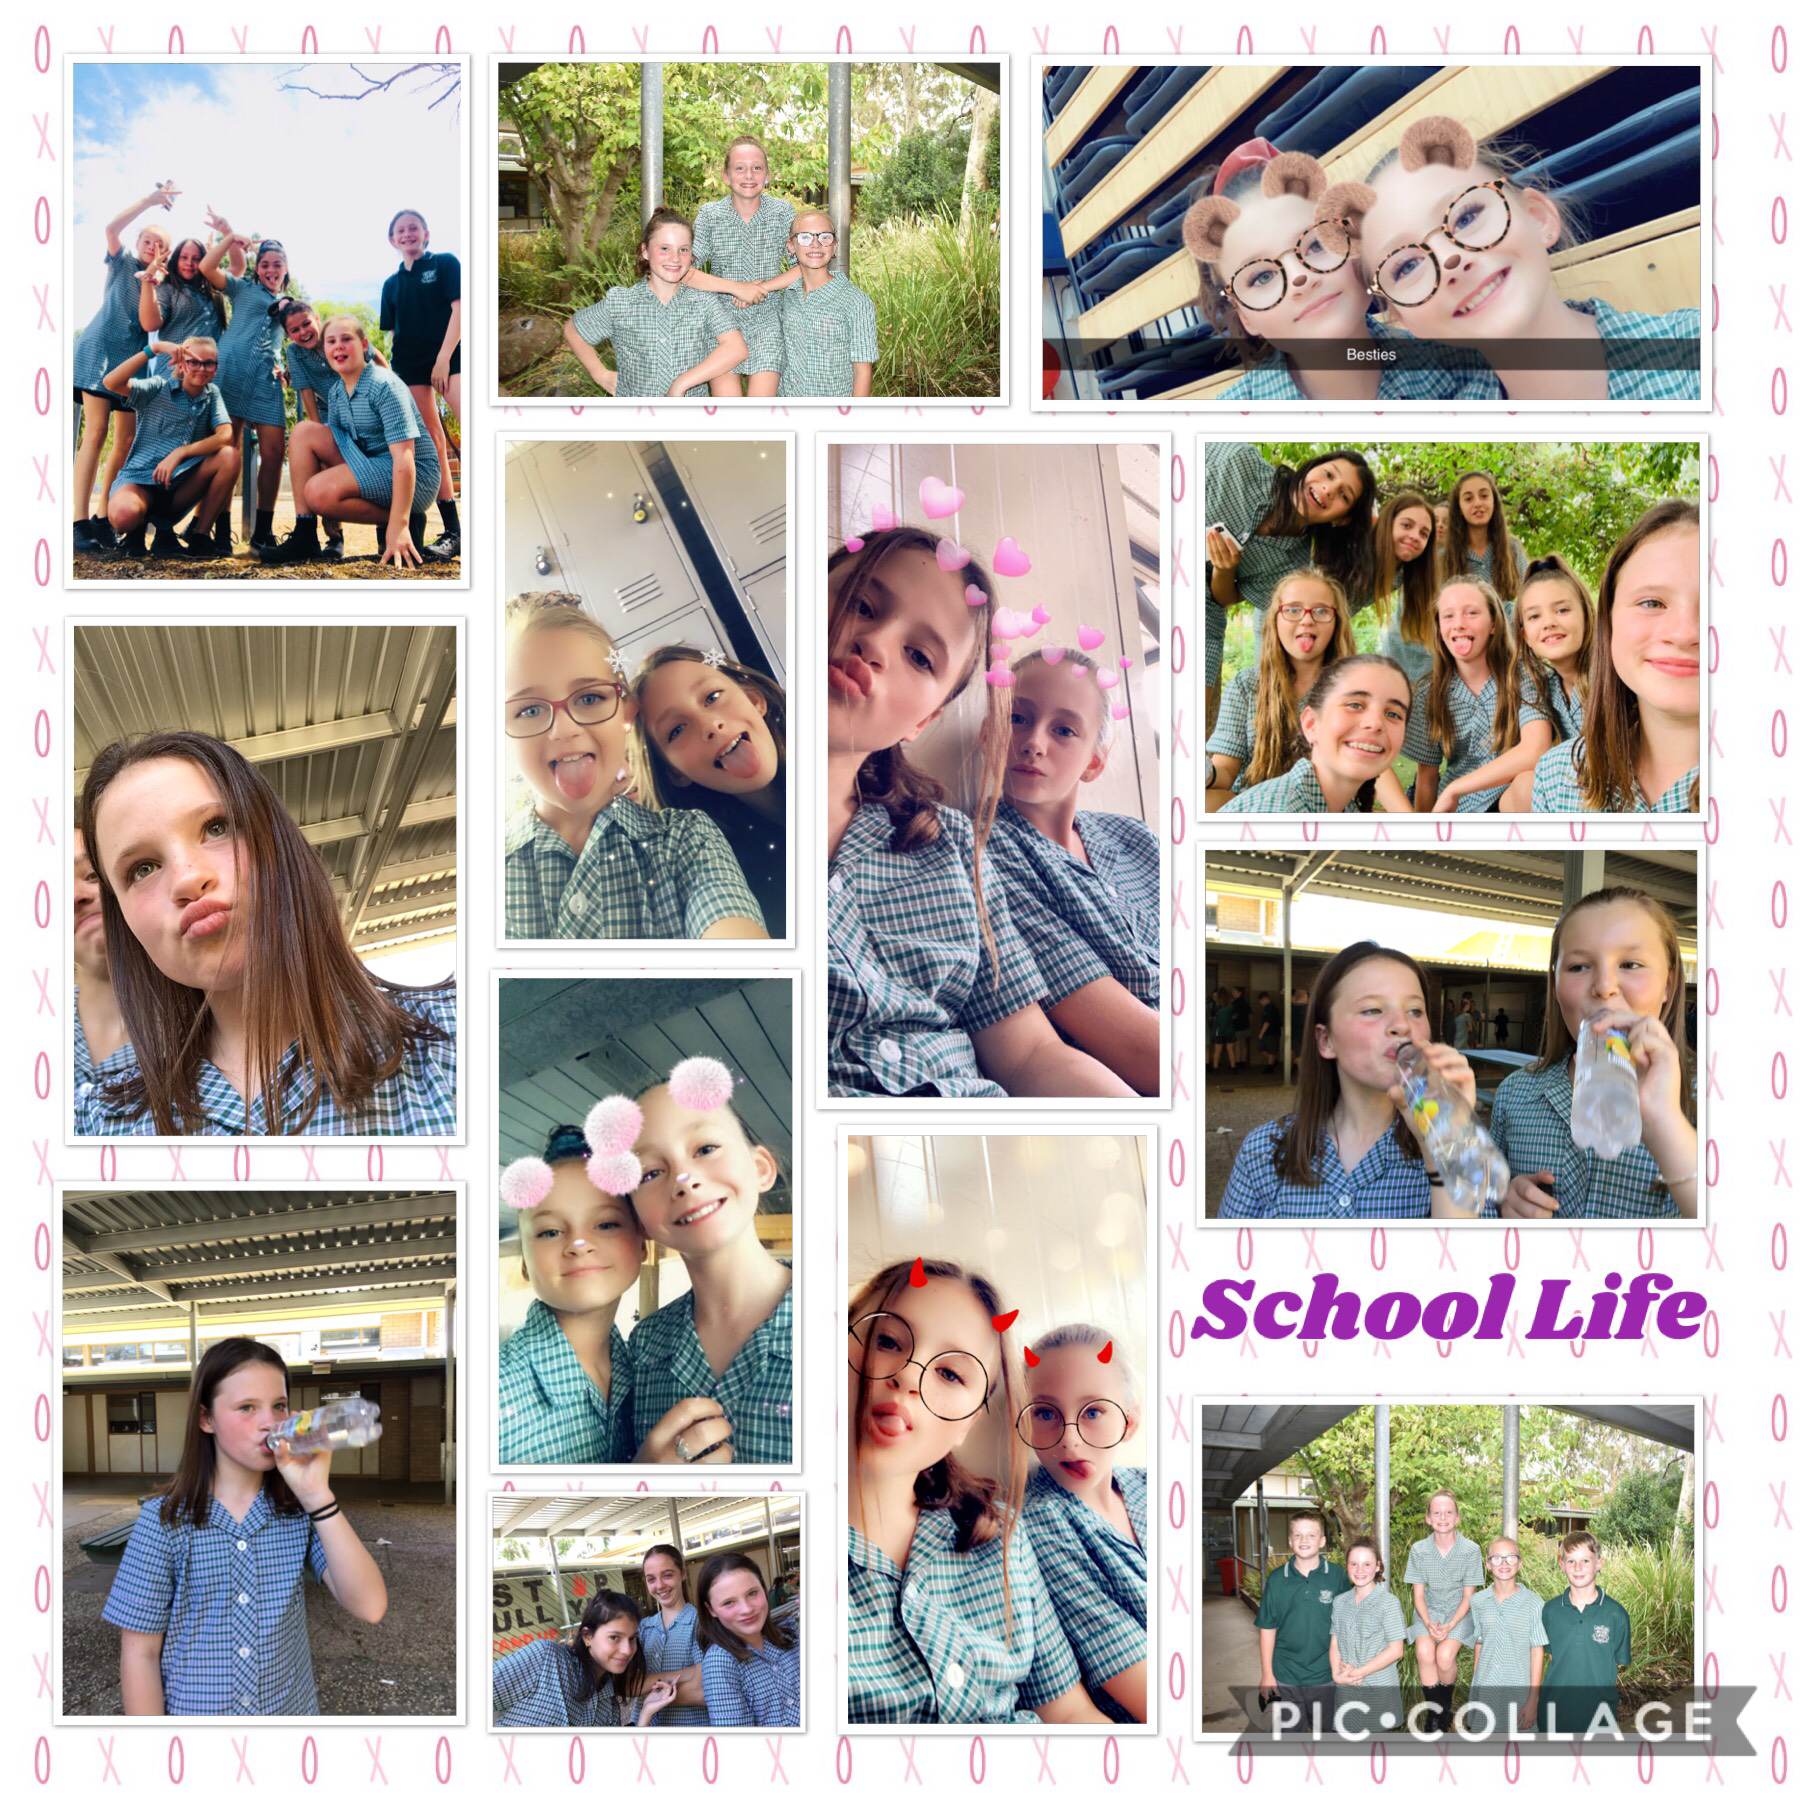 #school life 😉😉